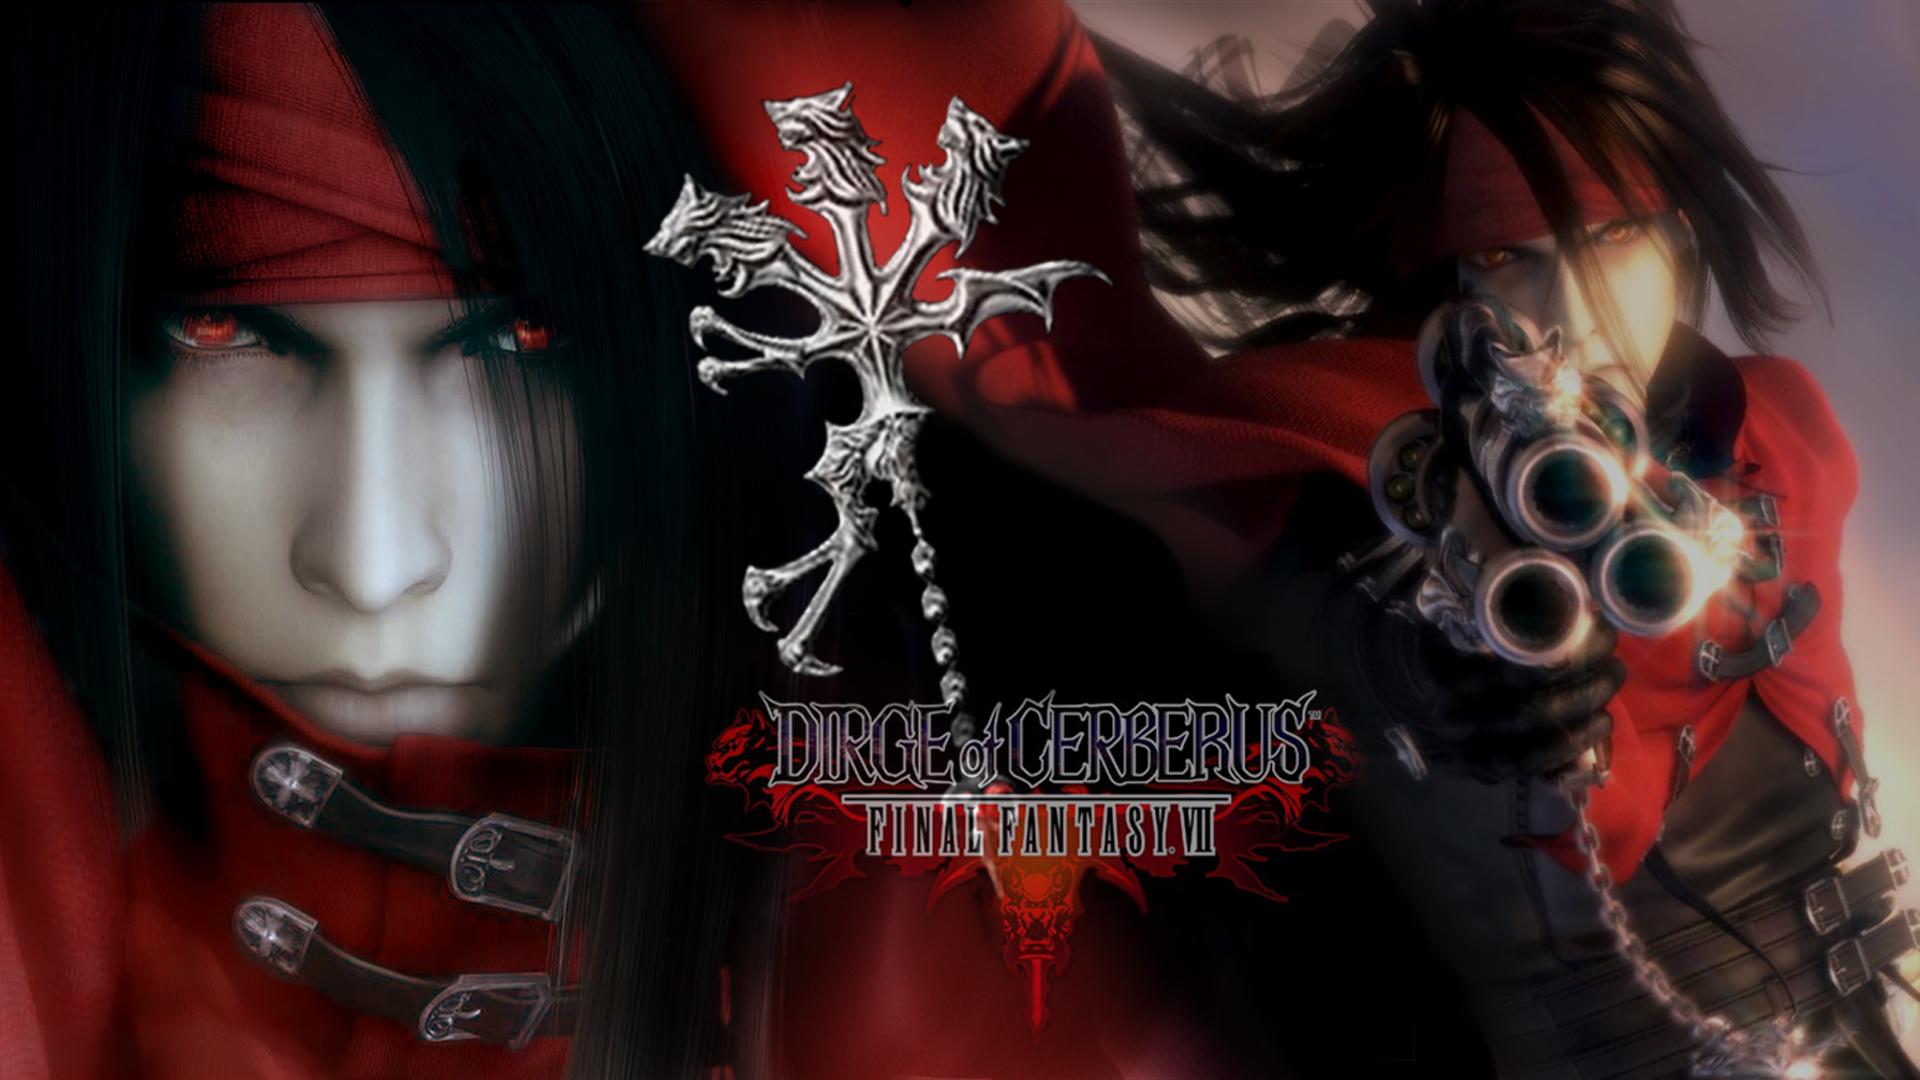 final fantasy: dirge of cerberus images vincent hd wallpaper and